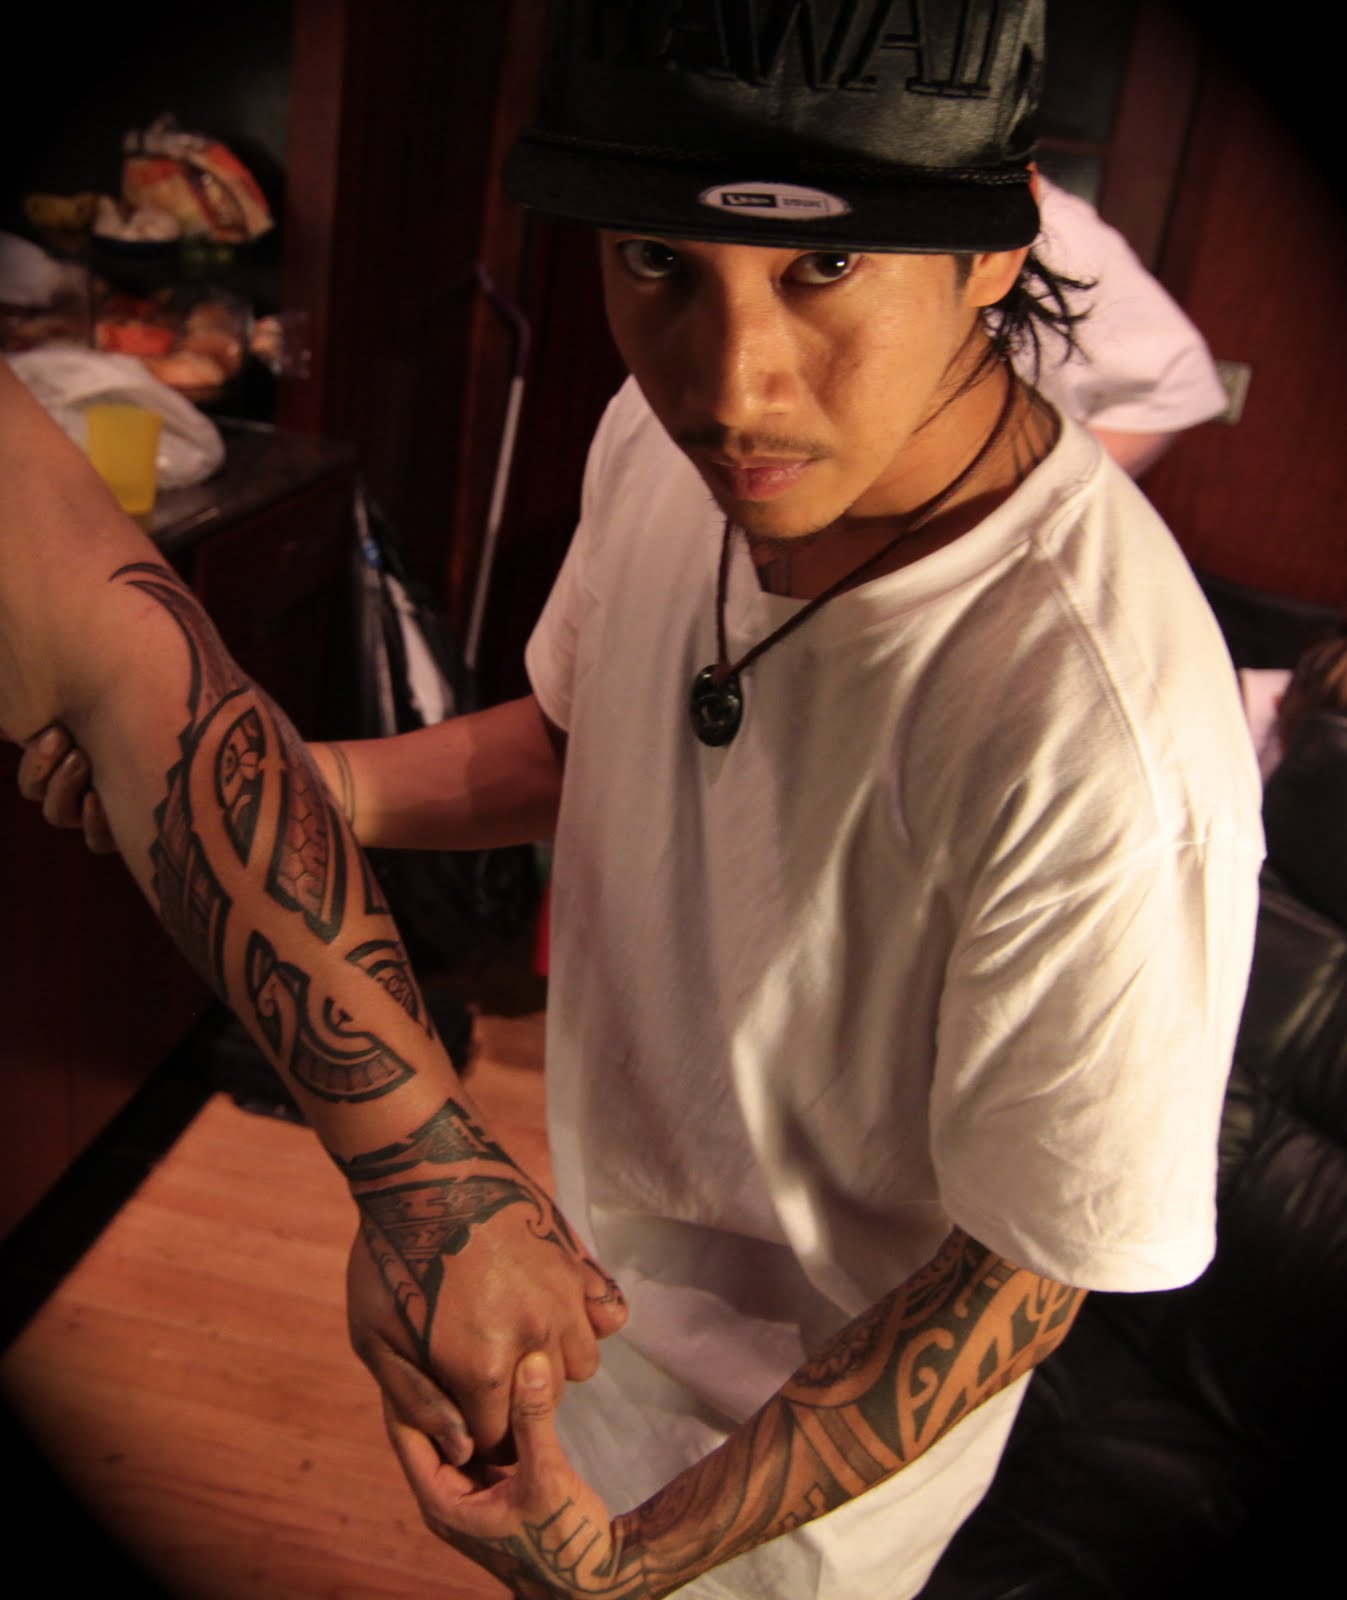 aloe12: Tattooing J BOOGS